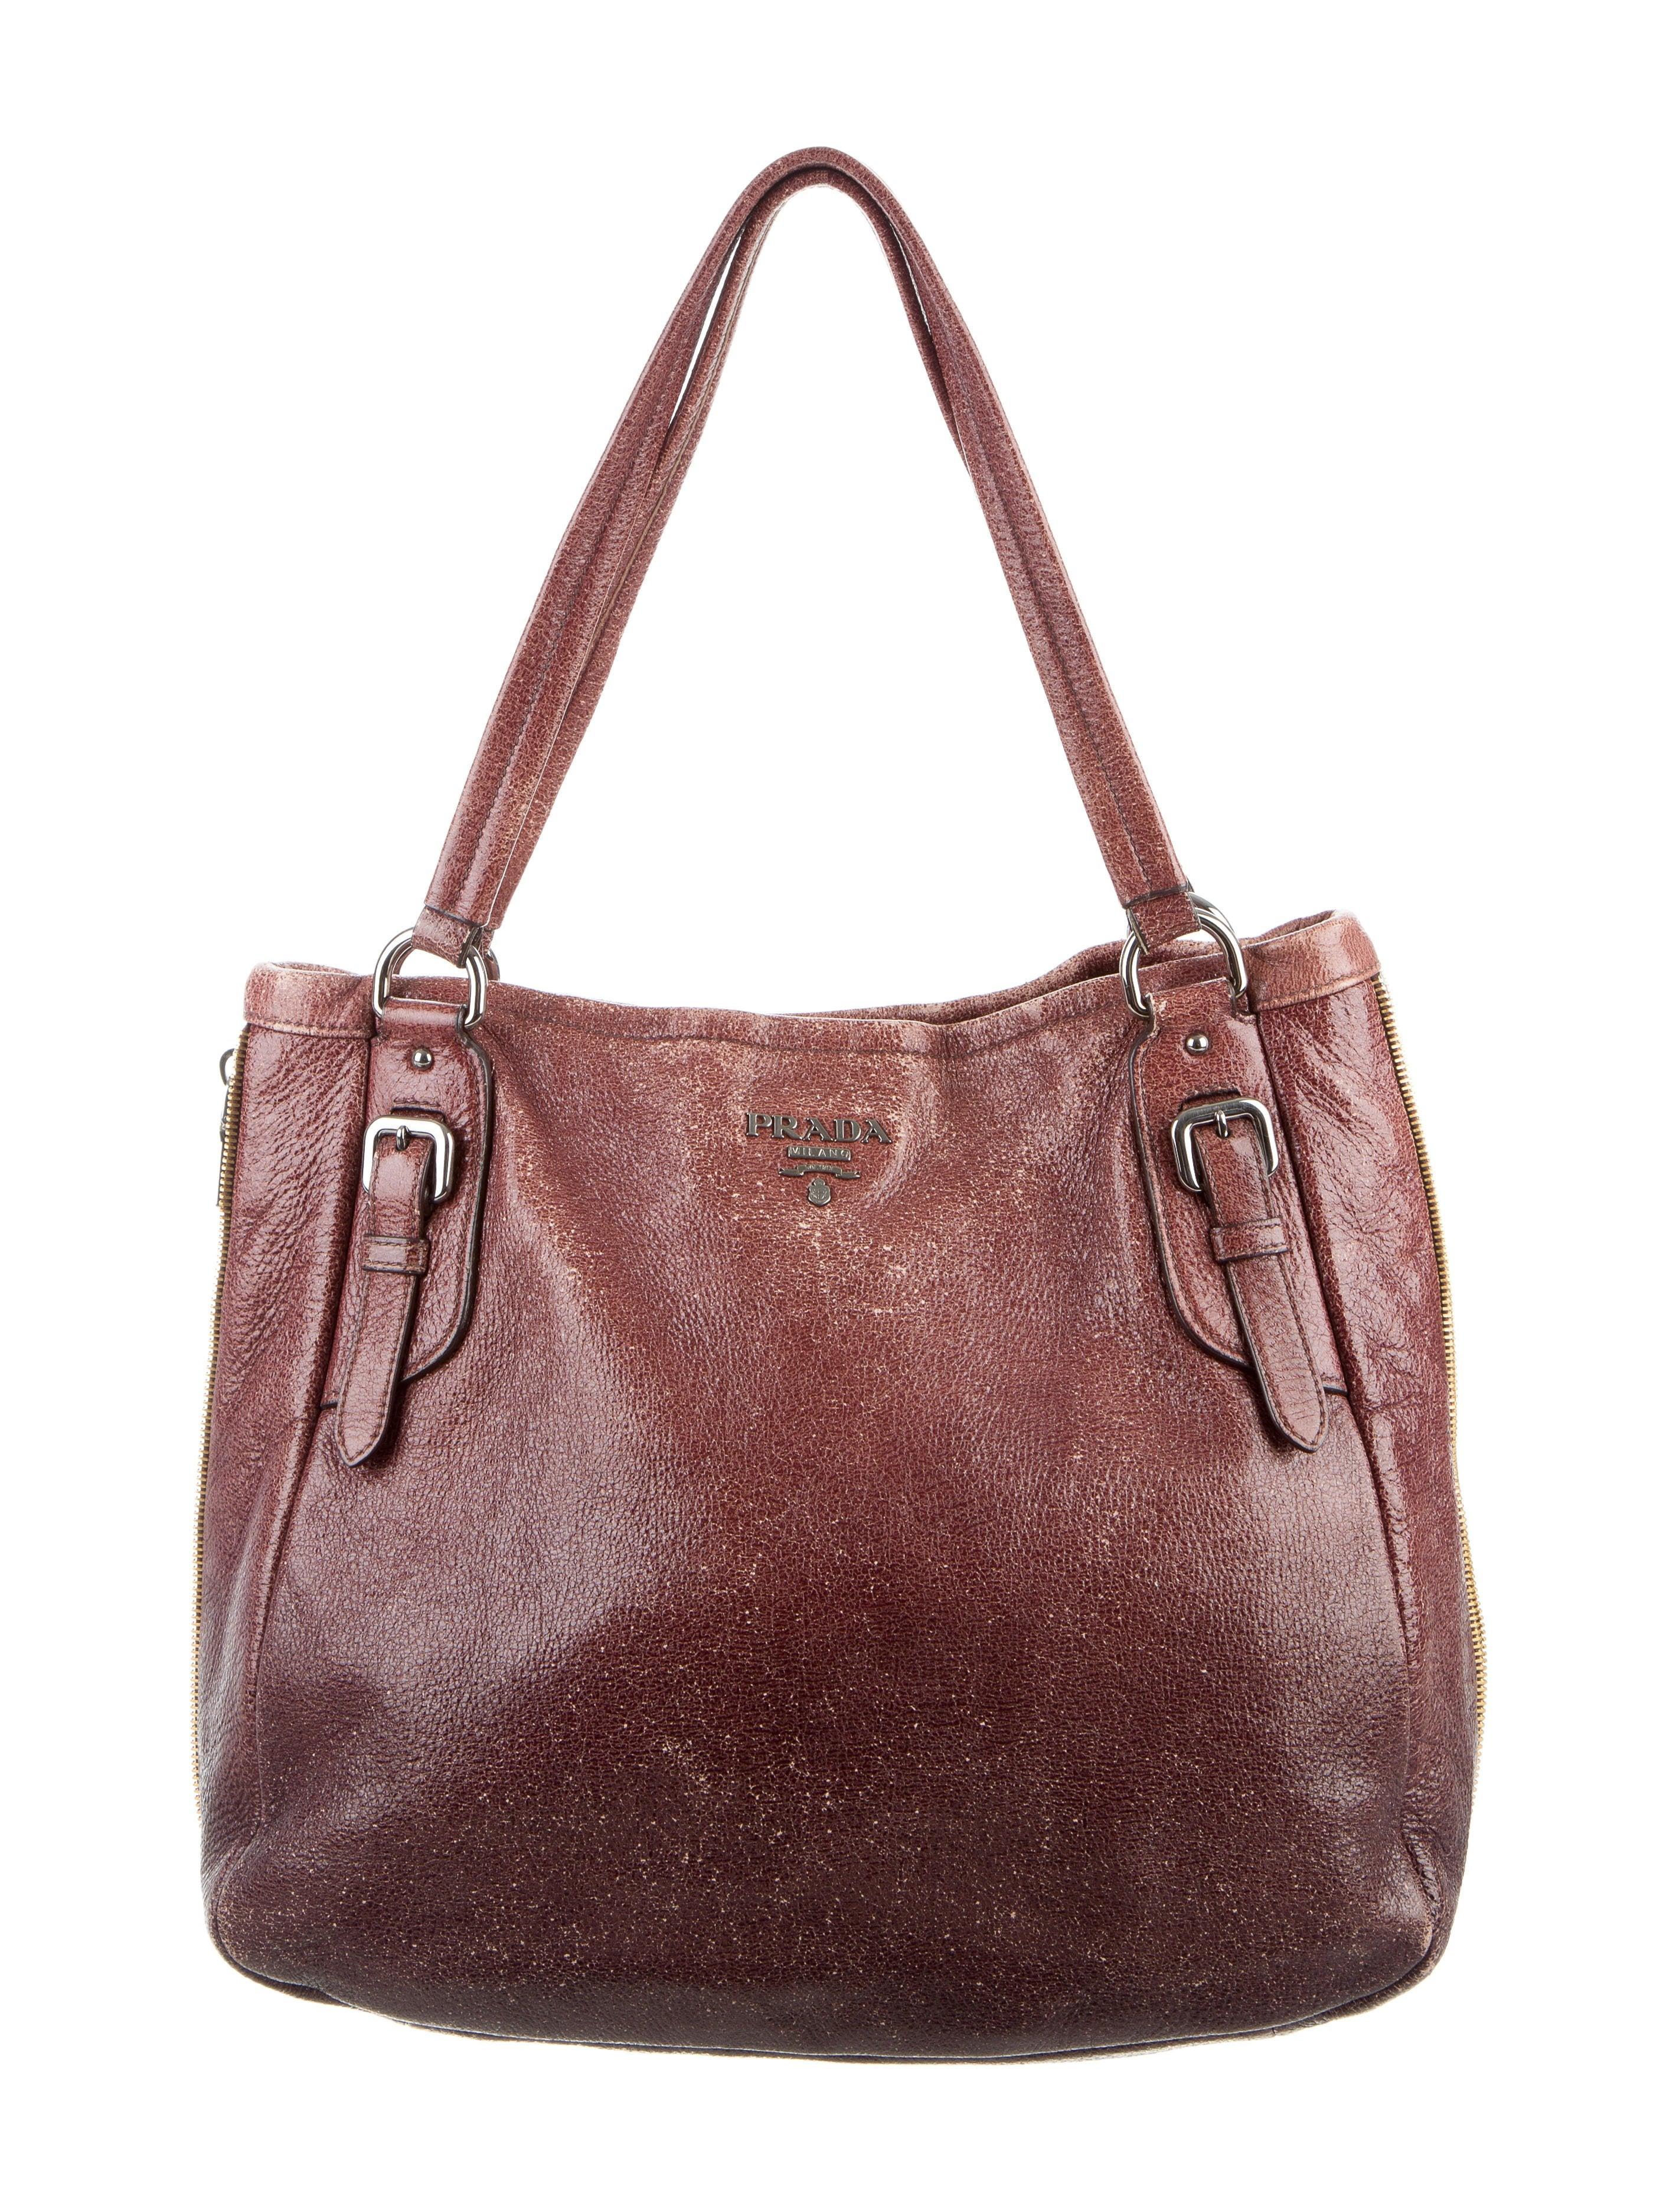 3d373931ca23 ... australia prada cervo lux tote handbags pra137032 the realreal 3cc3b  ea790